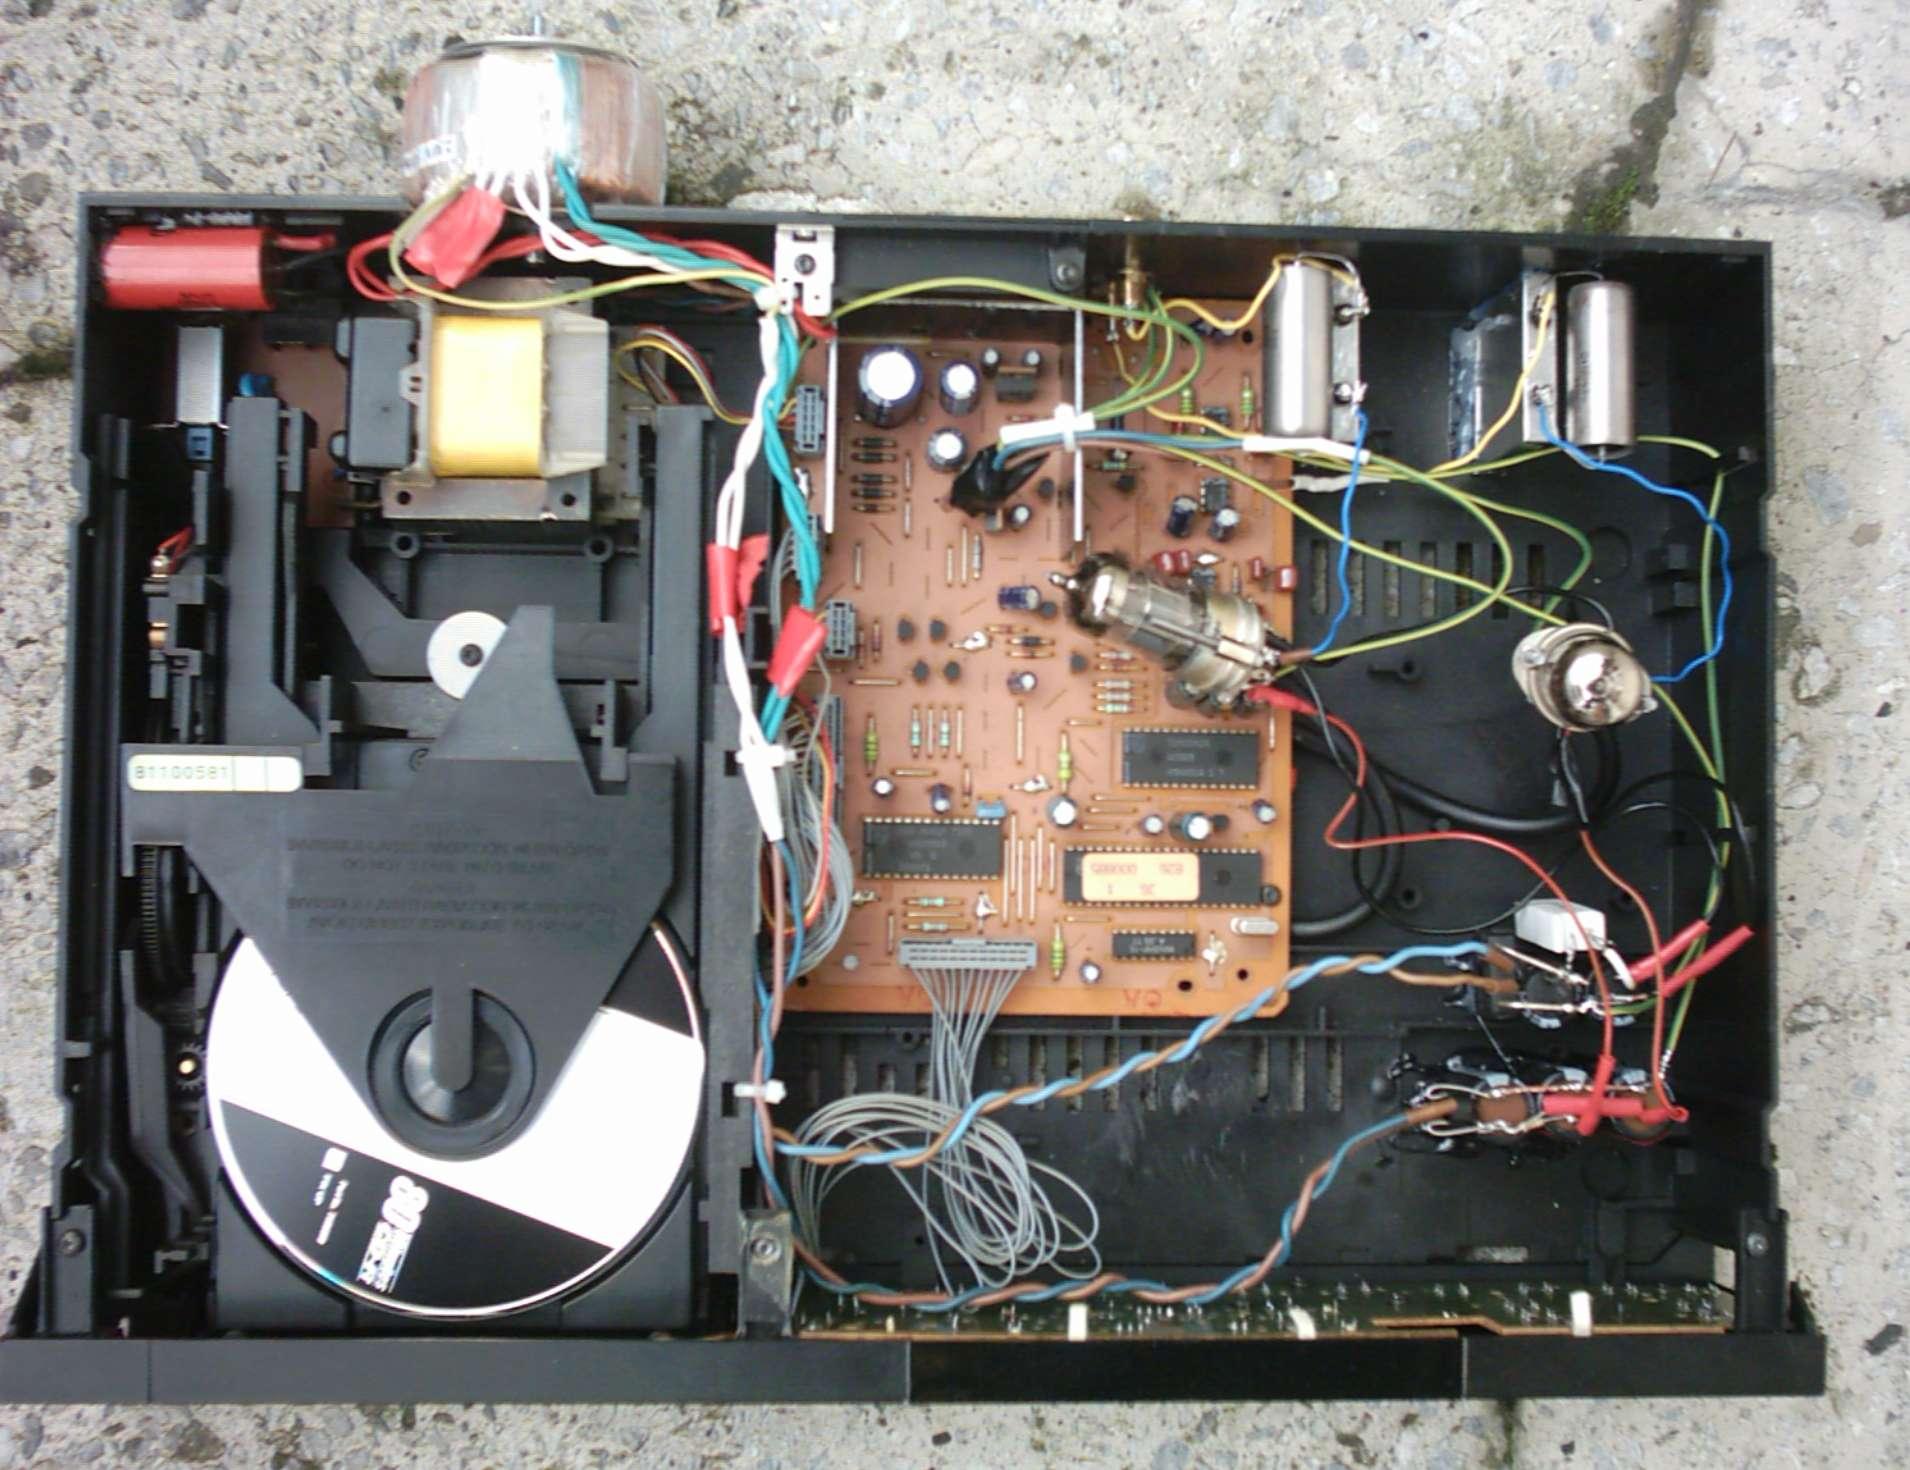 Cd 8100 Grundig Cd Player Lampizator Tubes Valve